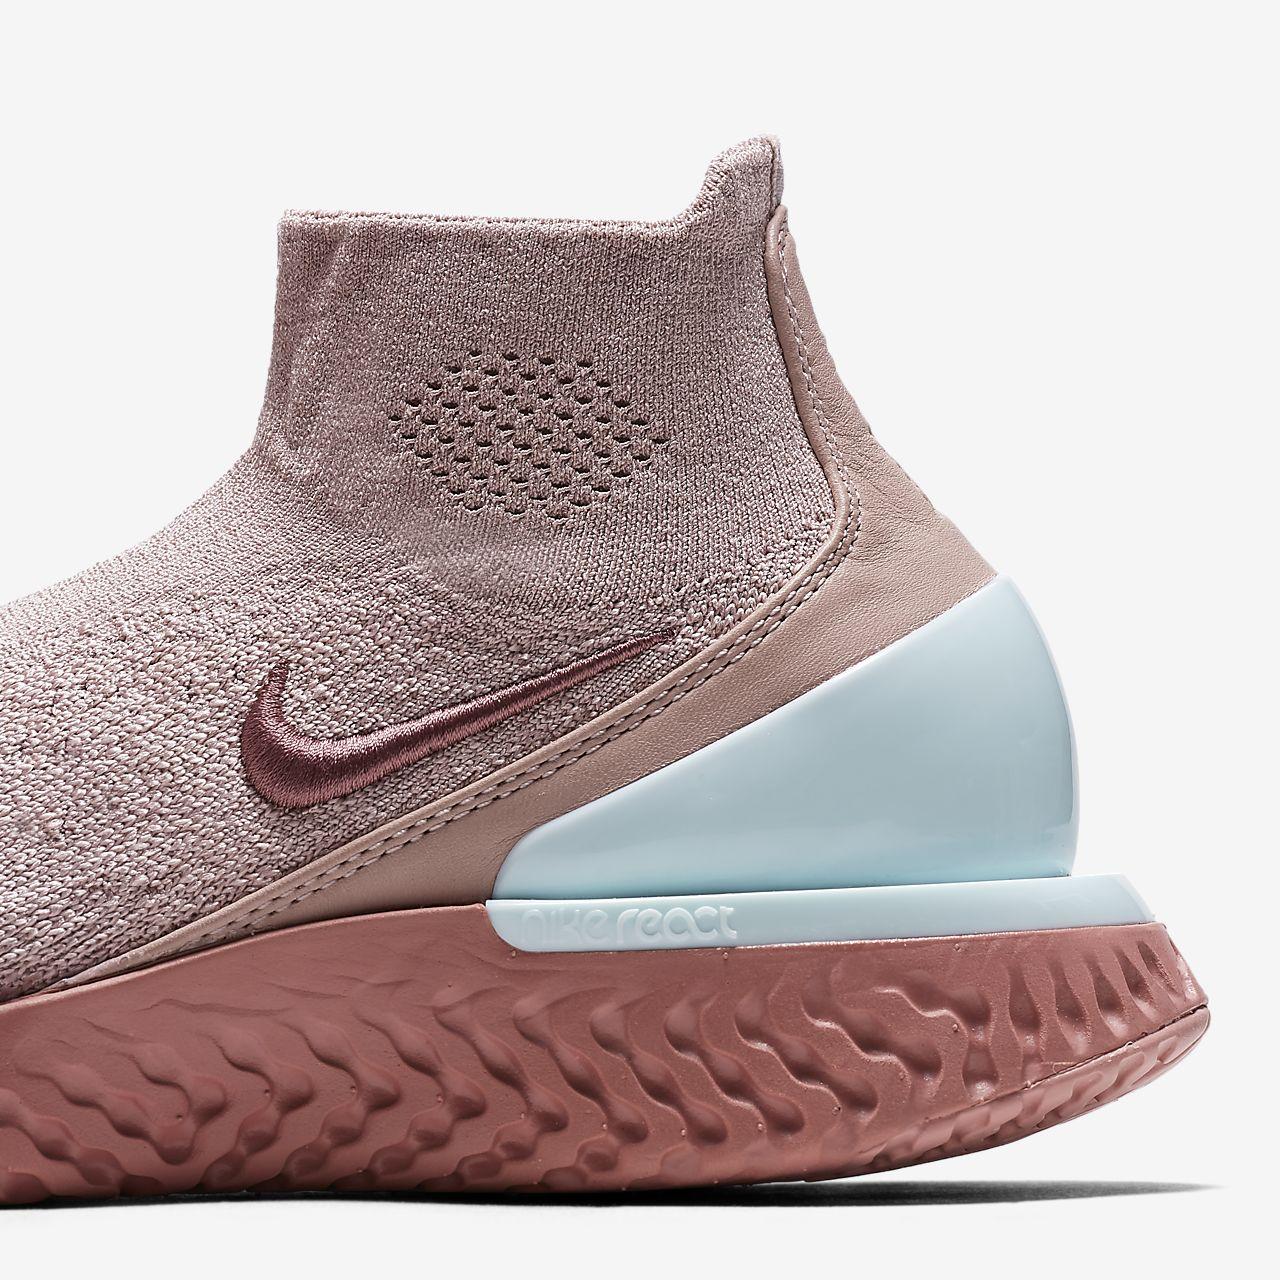 Running React Femme Rise De Flyknit Nike Pour Chaussure f7YyvIb6g